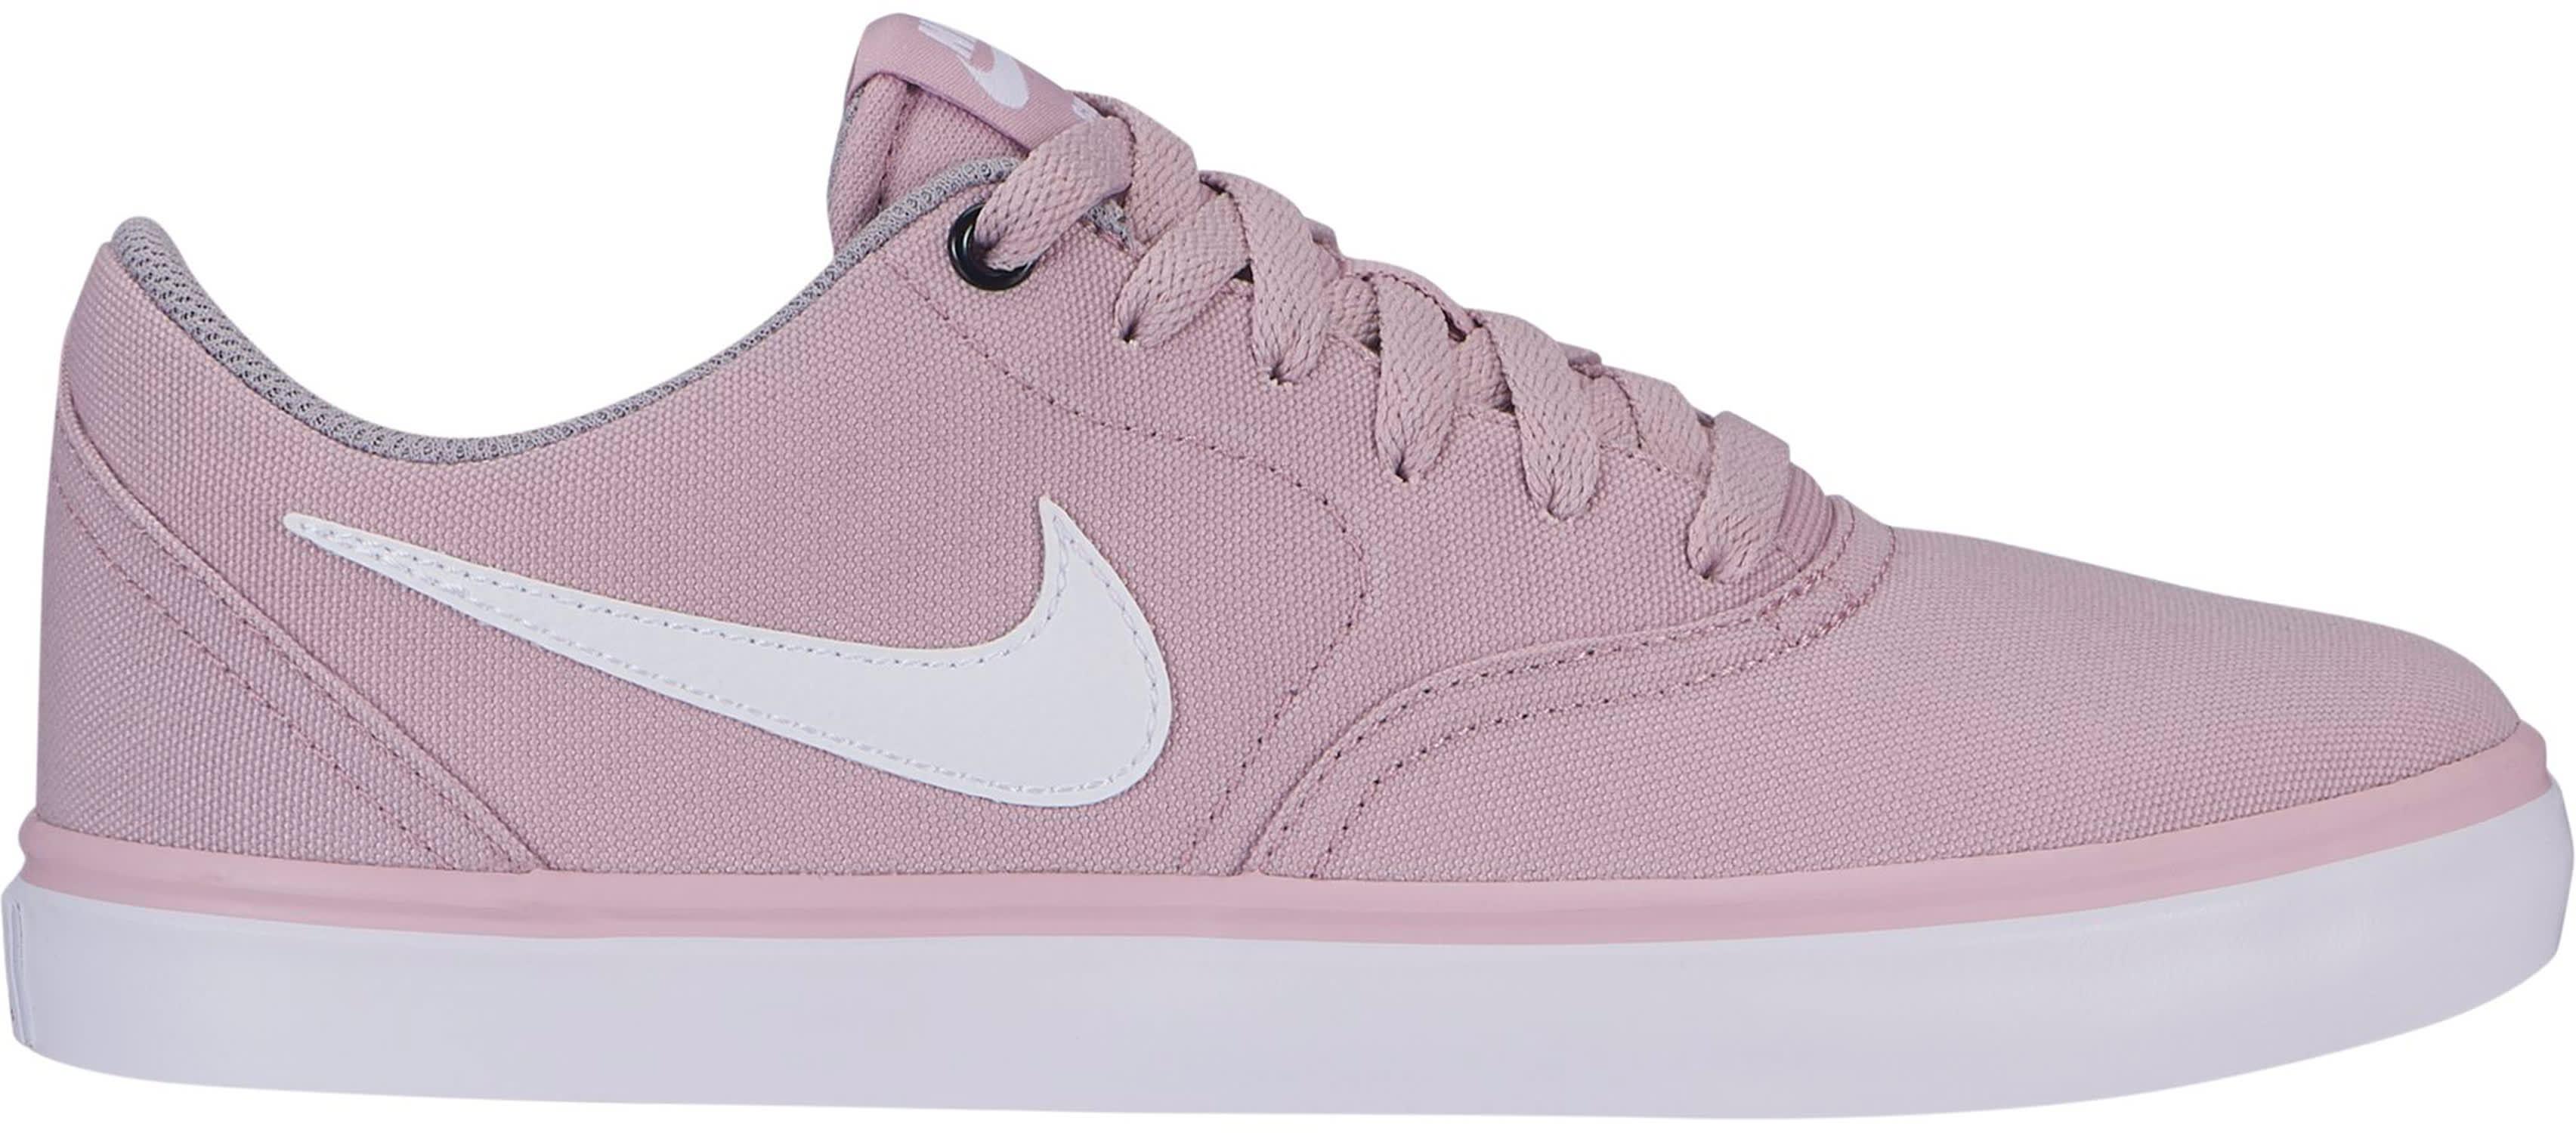 f85d4b15a8cc3 Nike SB Check Solarsoft Canvas Skate Shoes - Womens 2019